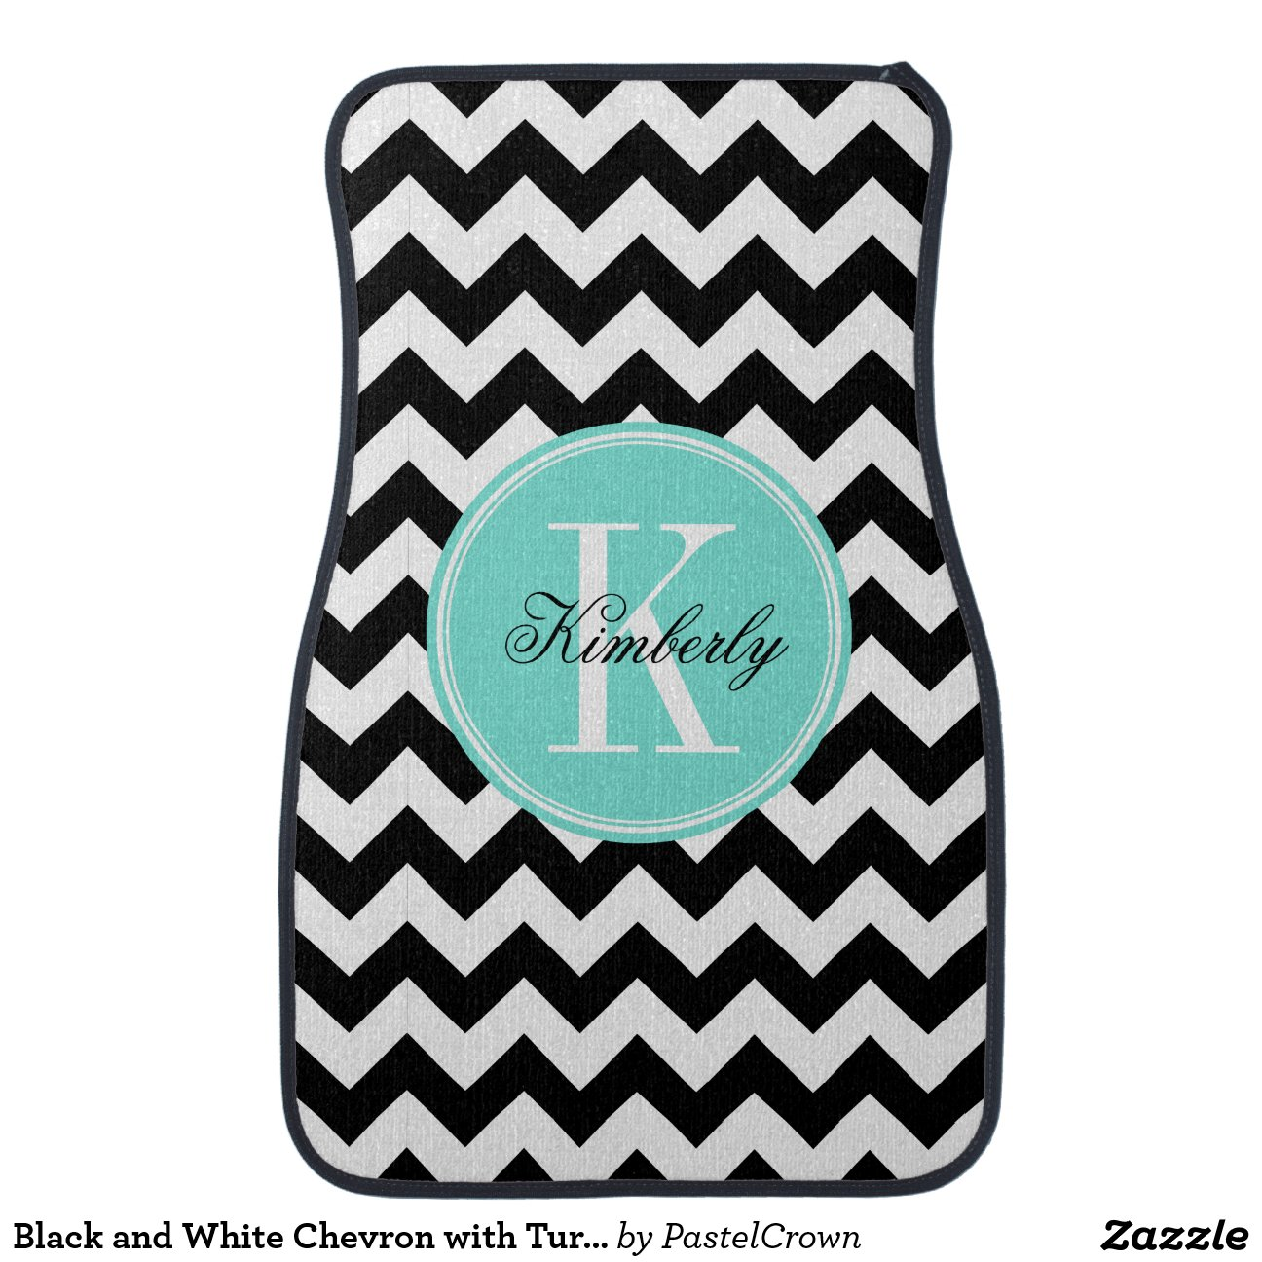 Black And White Chevron With Turquoise Monogram Floor Mat